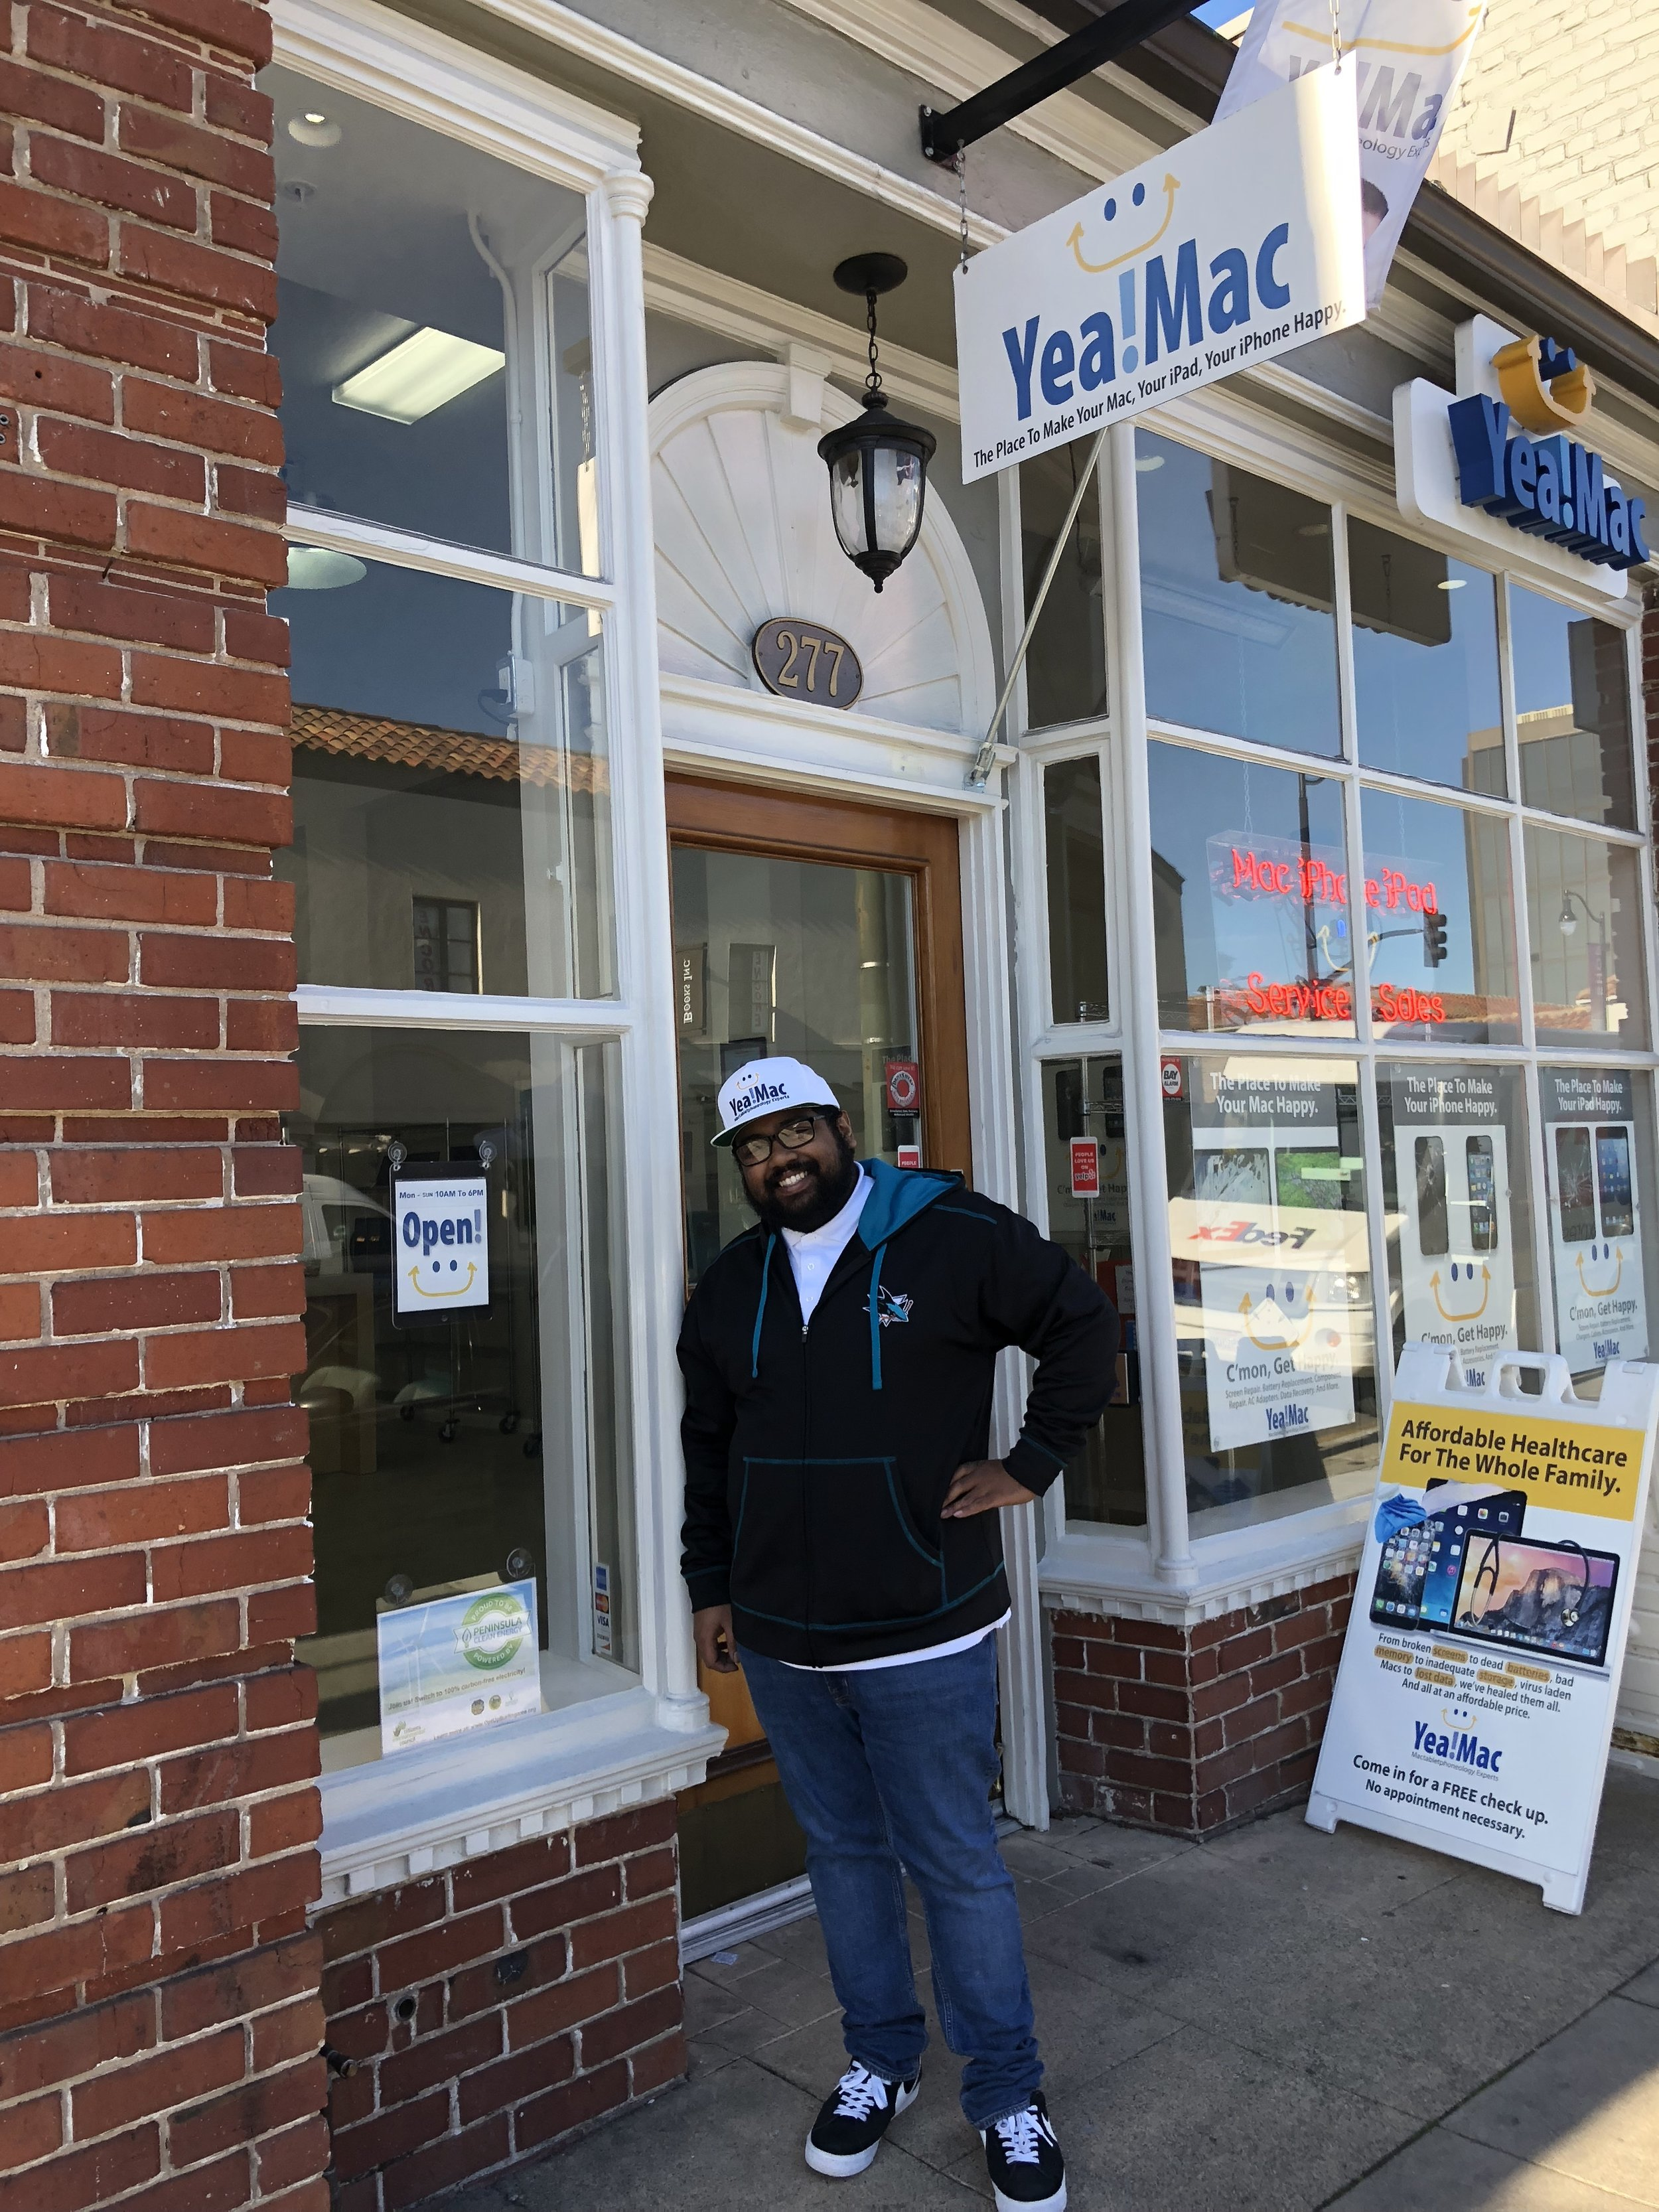 Yea!Mac employee next to #OptUpBurlingame sign.